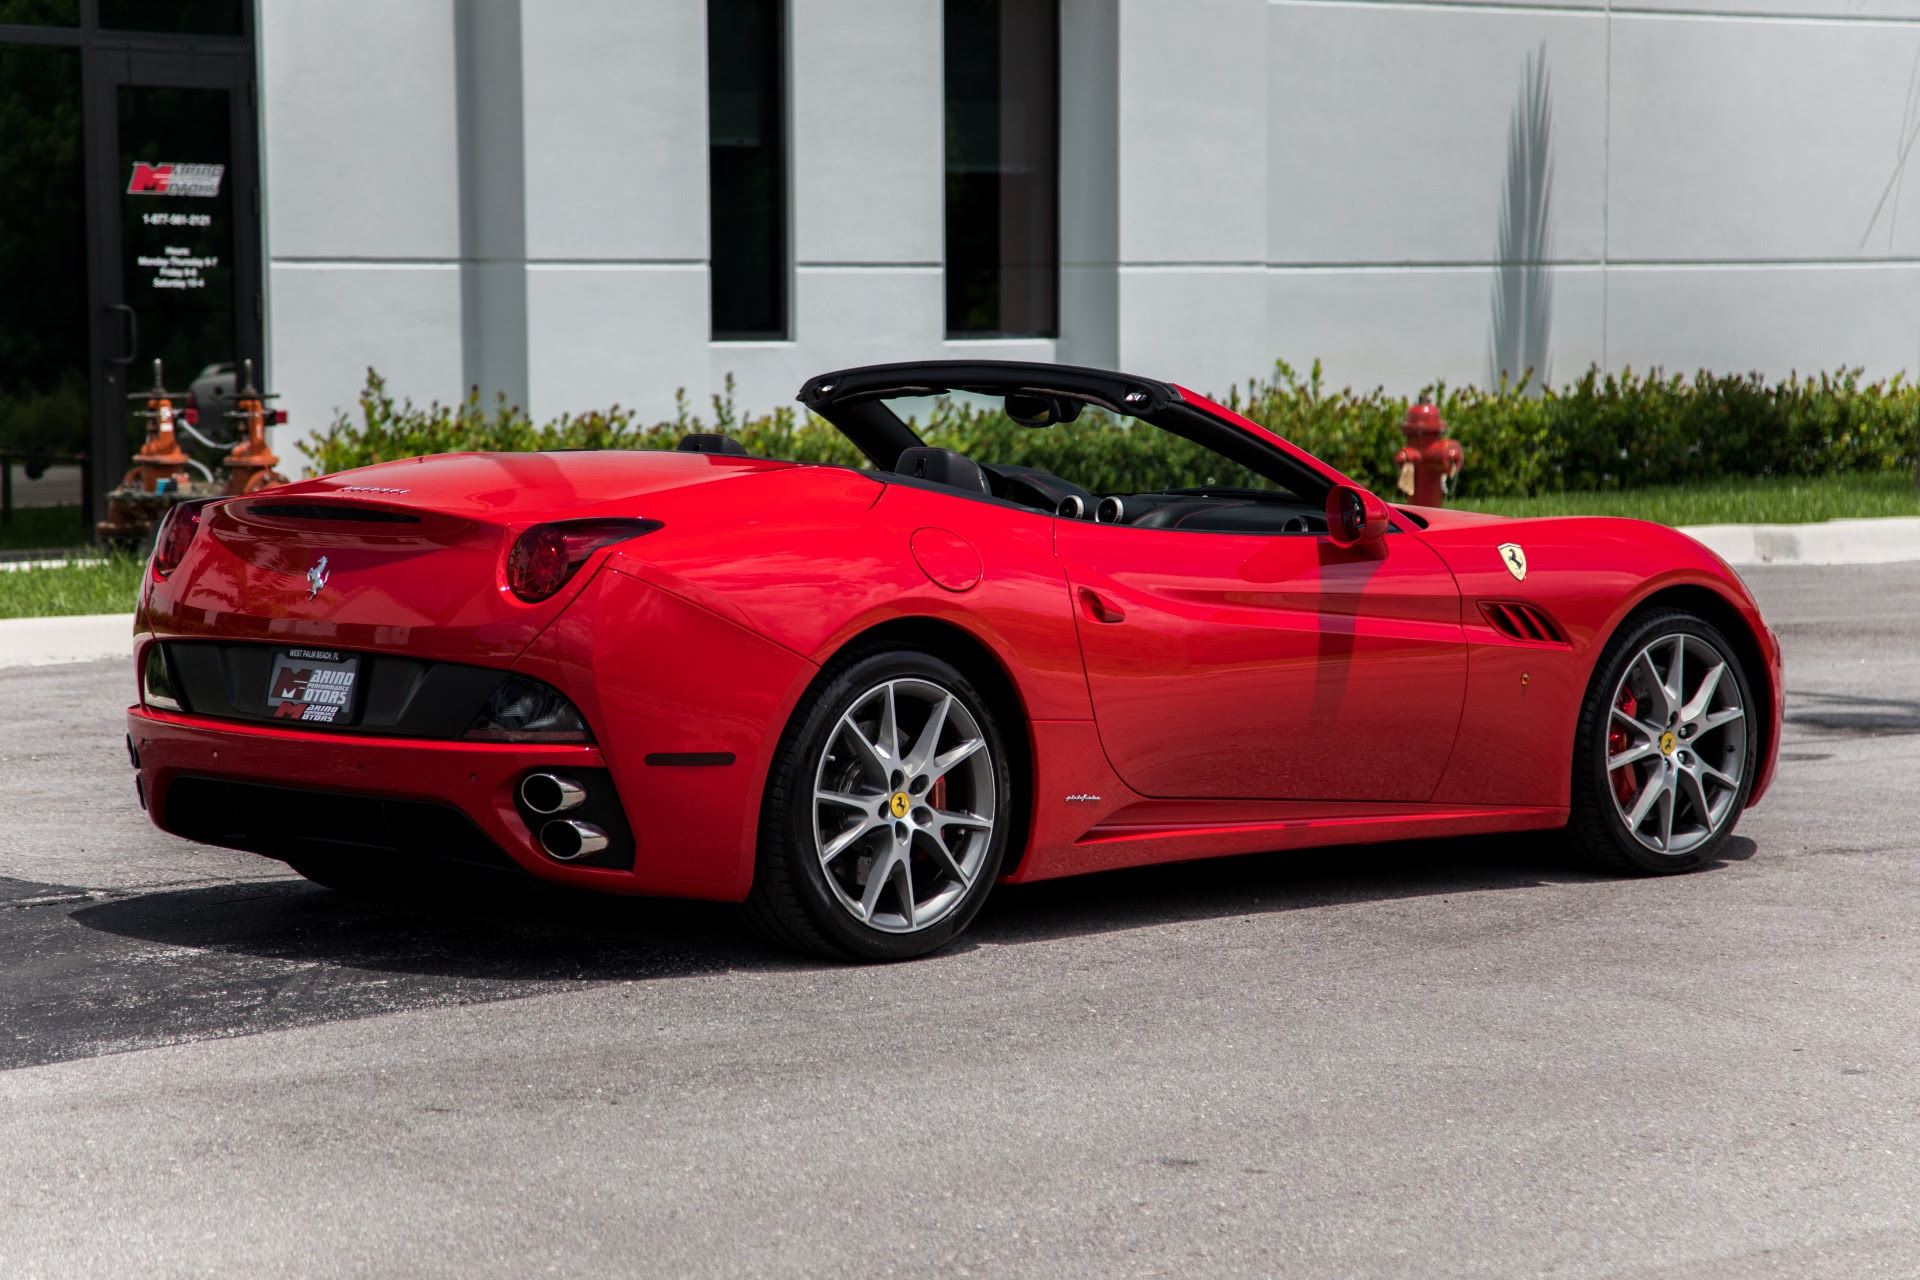 Used 2010 Ferrari California For Sale ($92,900) | Marino ...